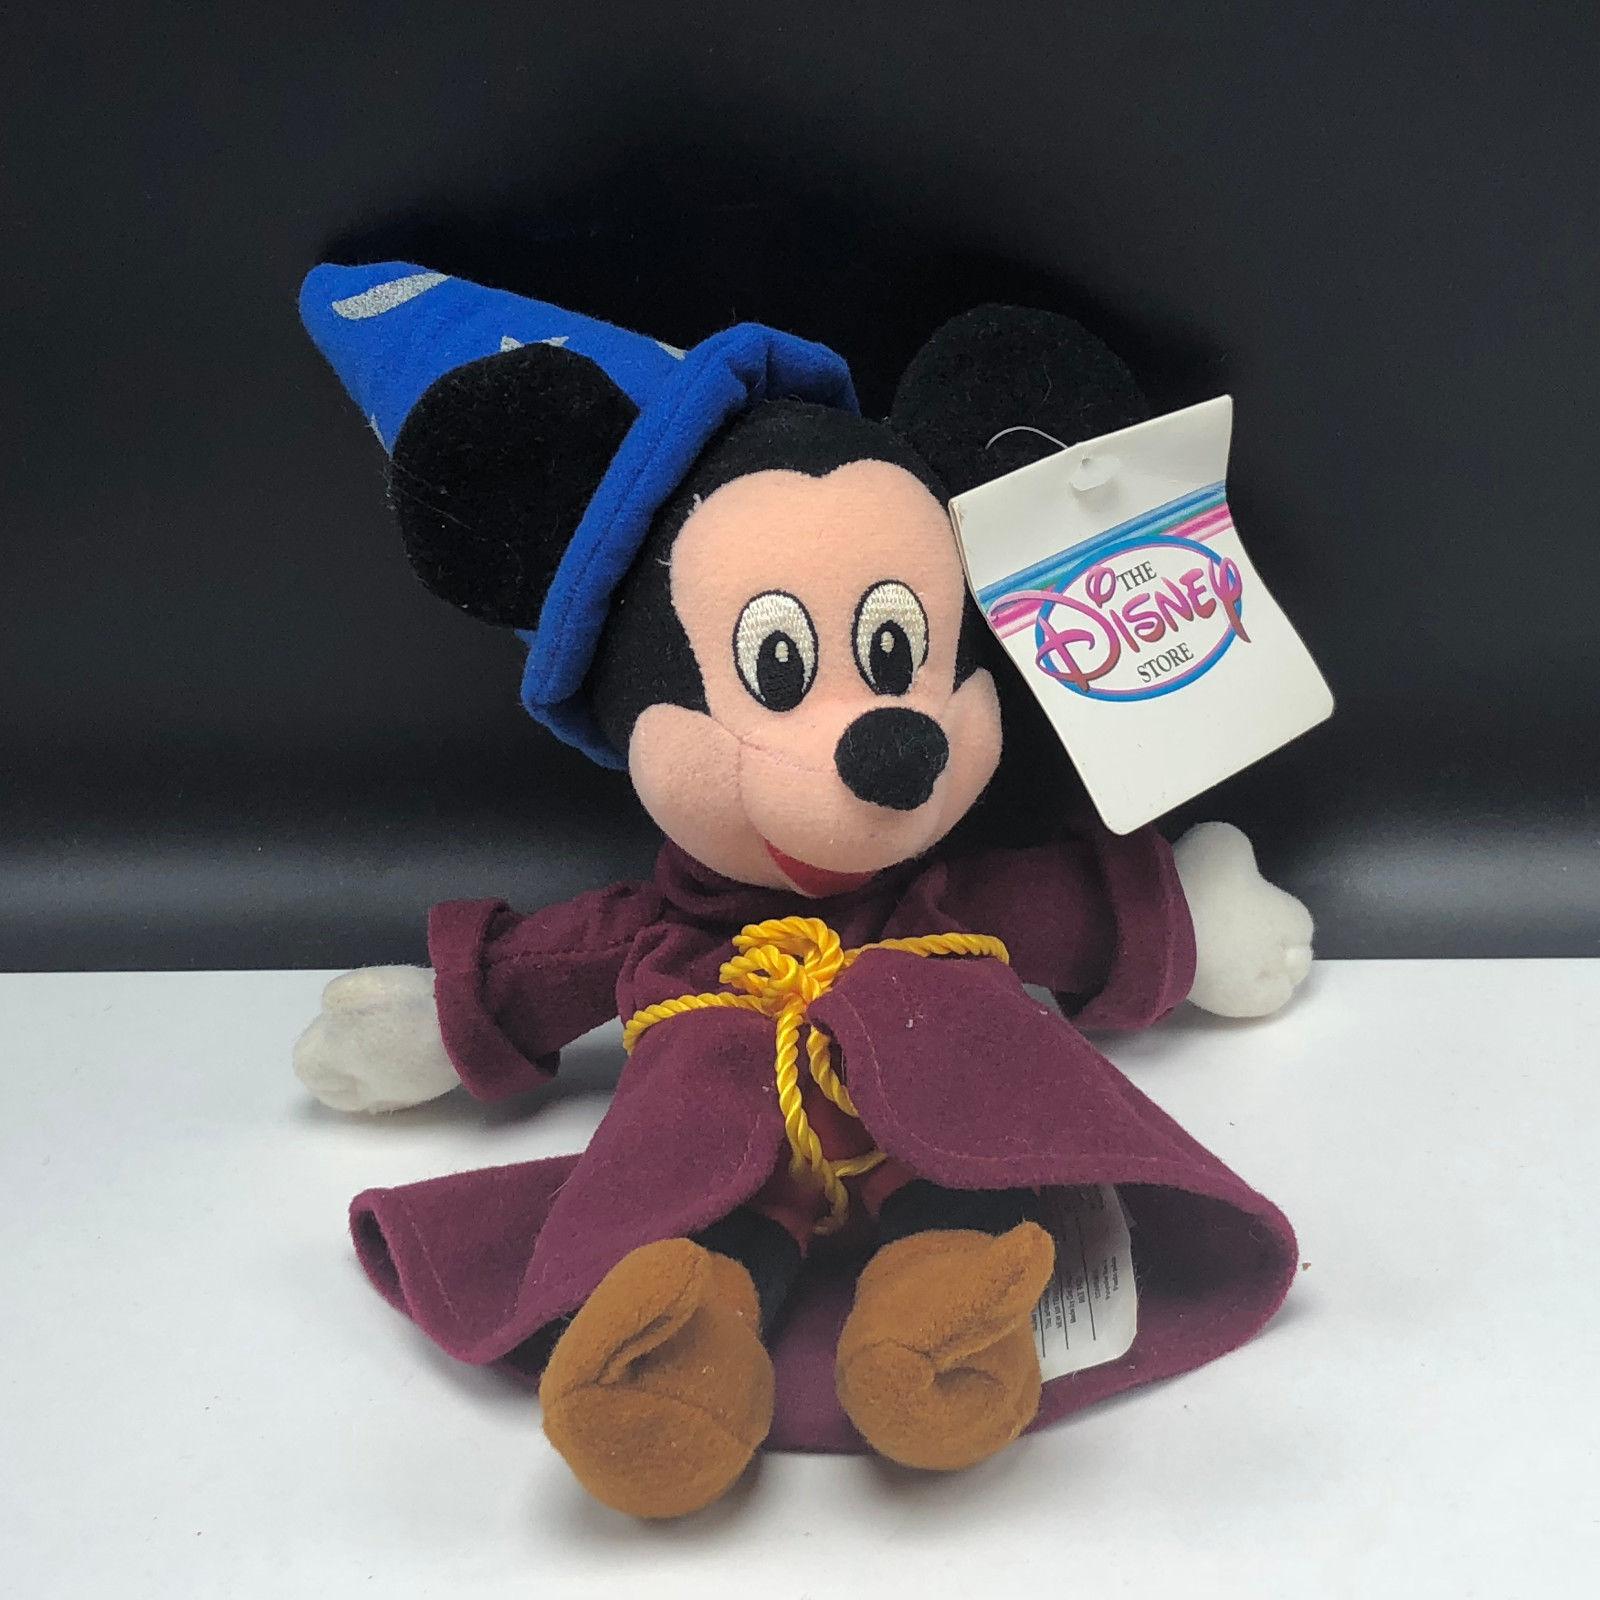 The Disney Store Sorcerer Mickey Mouse Mini Bean Bag-beanie Toys & Hobbies